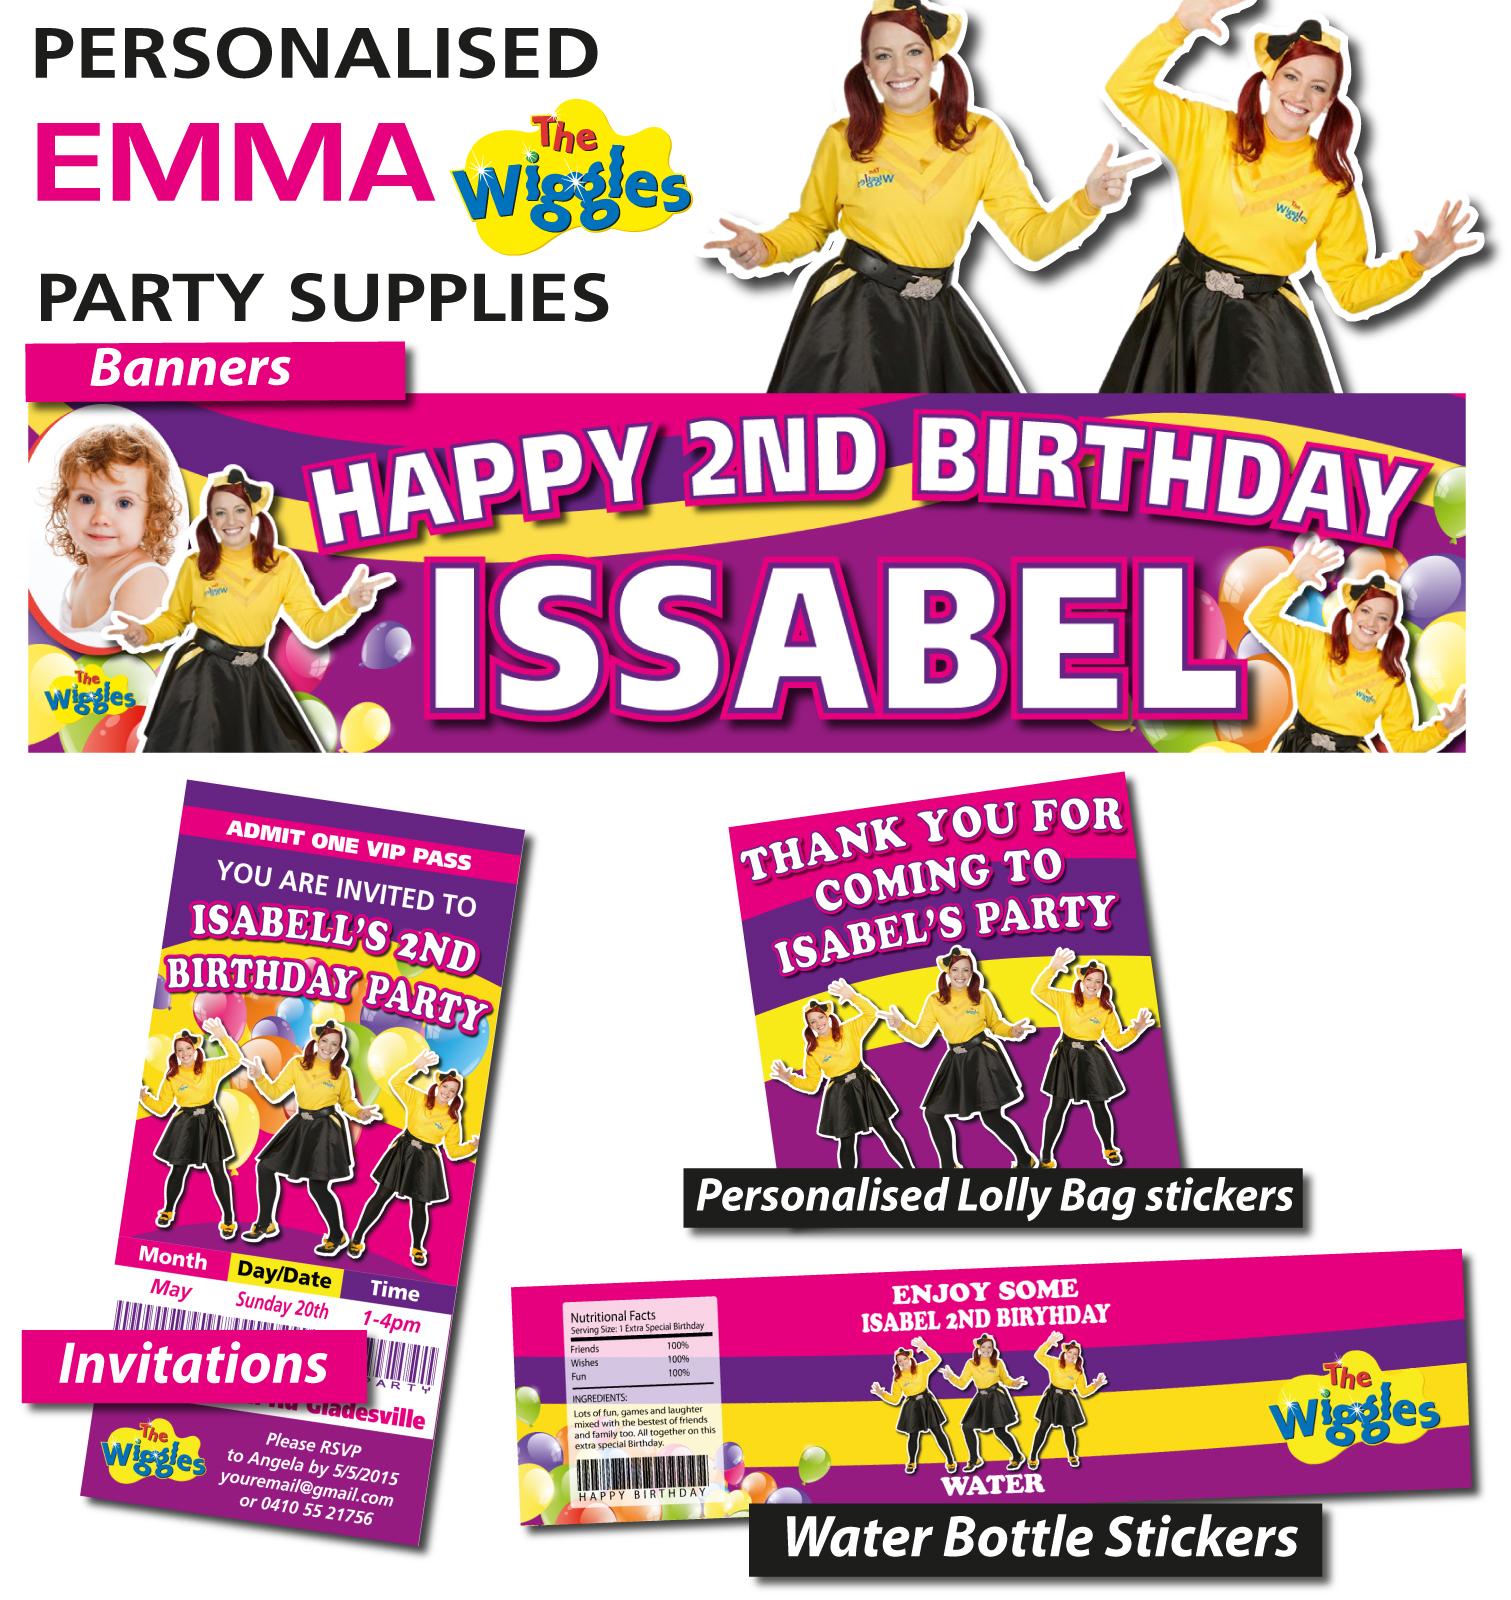 wiggles-emma-birthday-banner-ebay.jpg